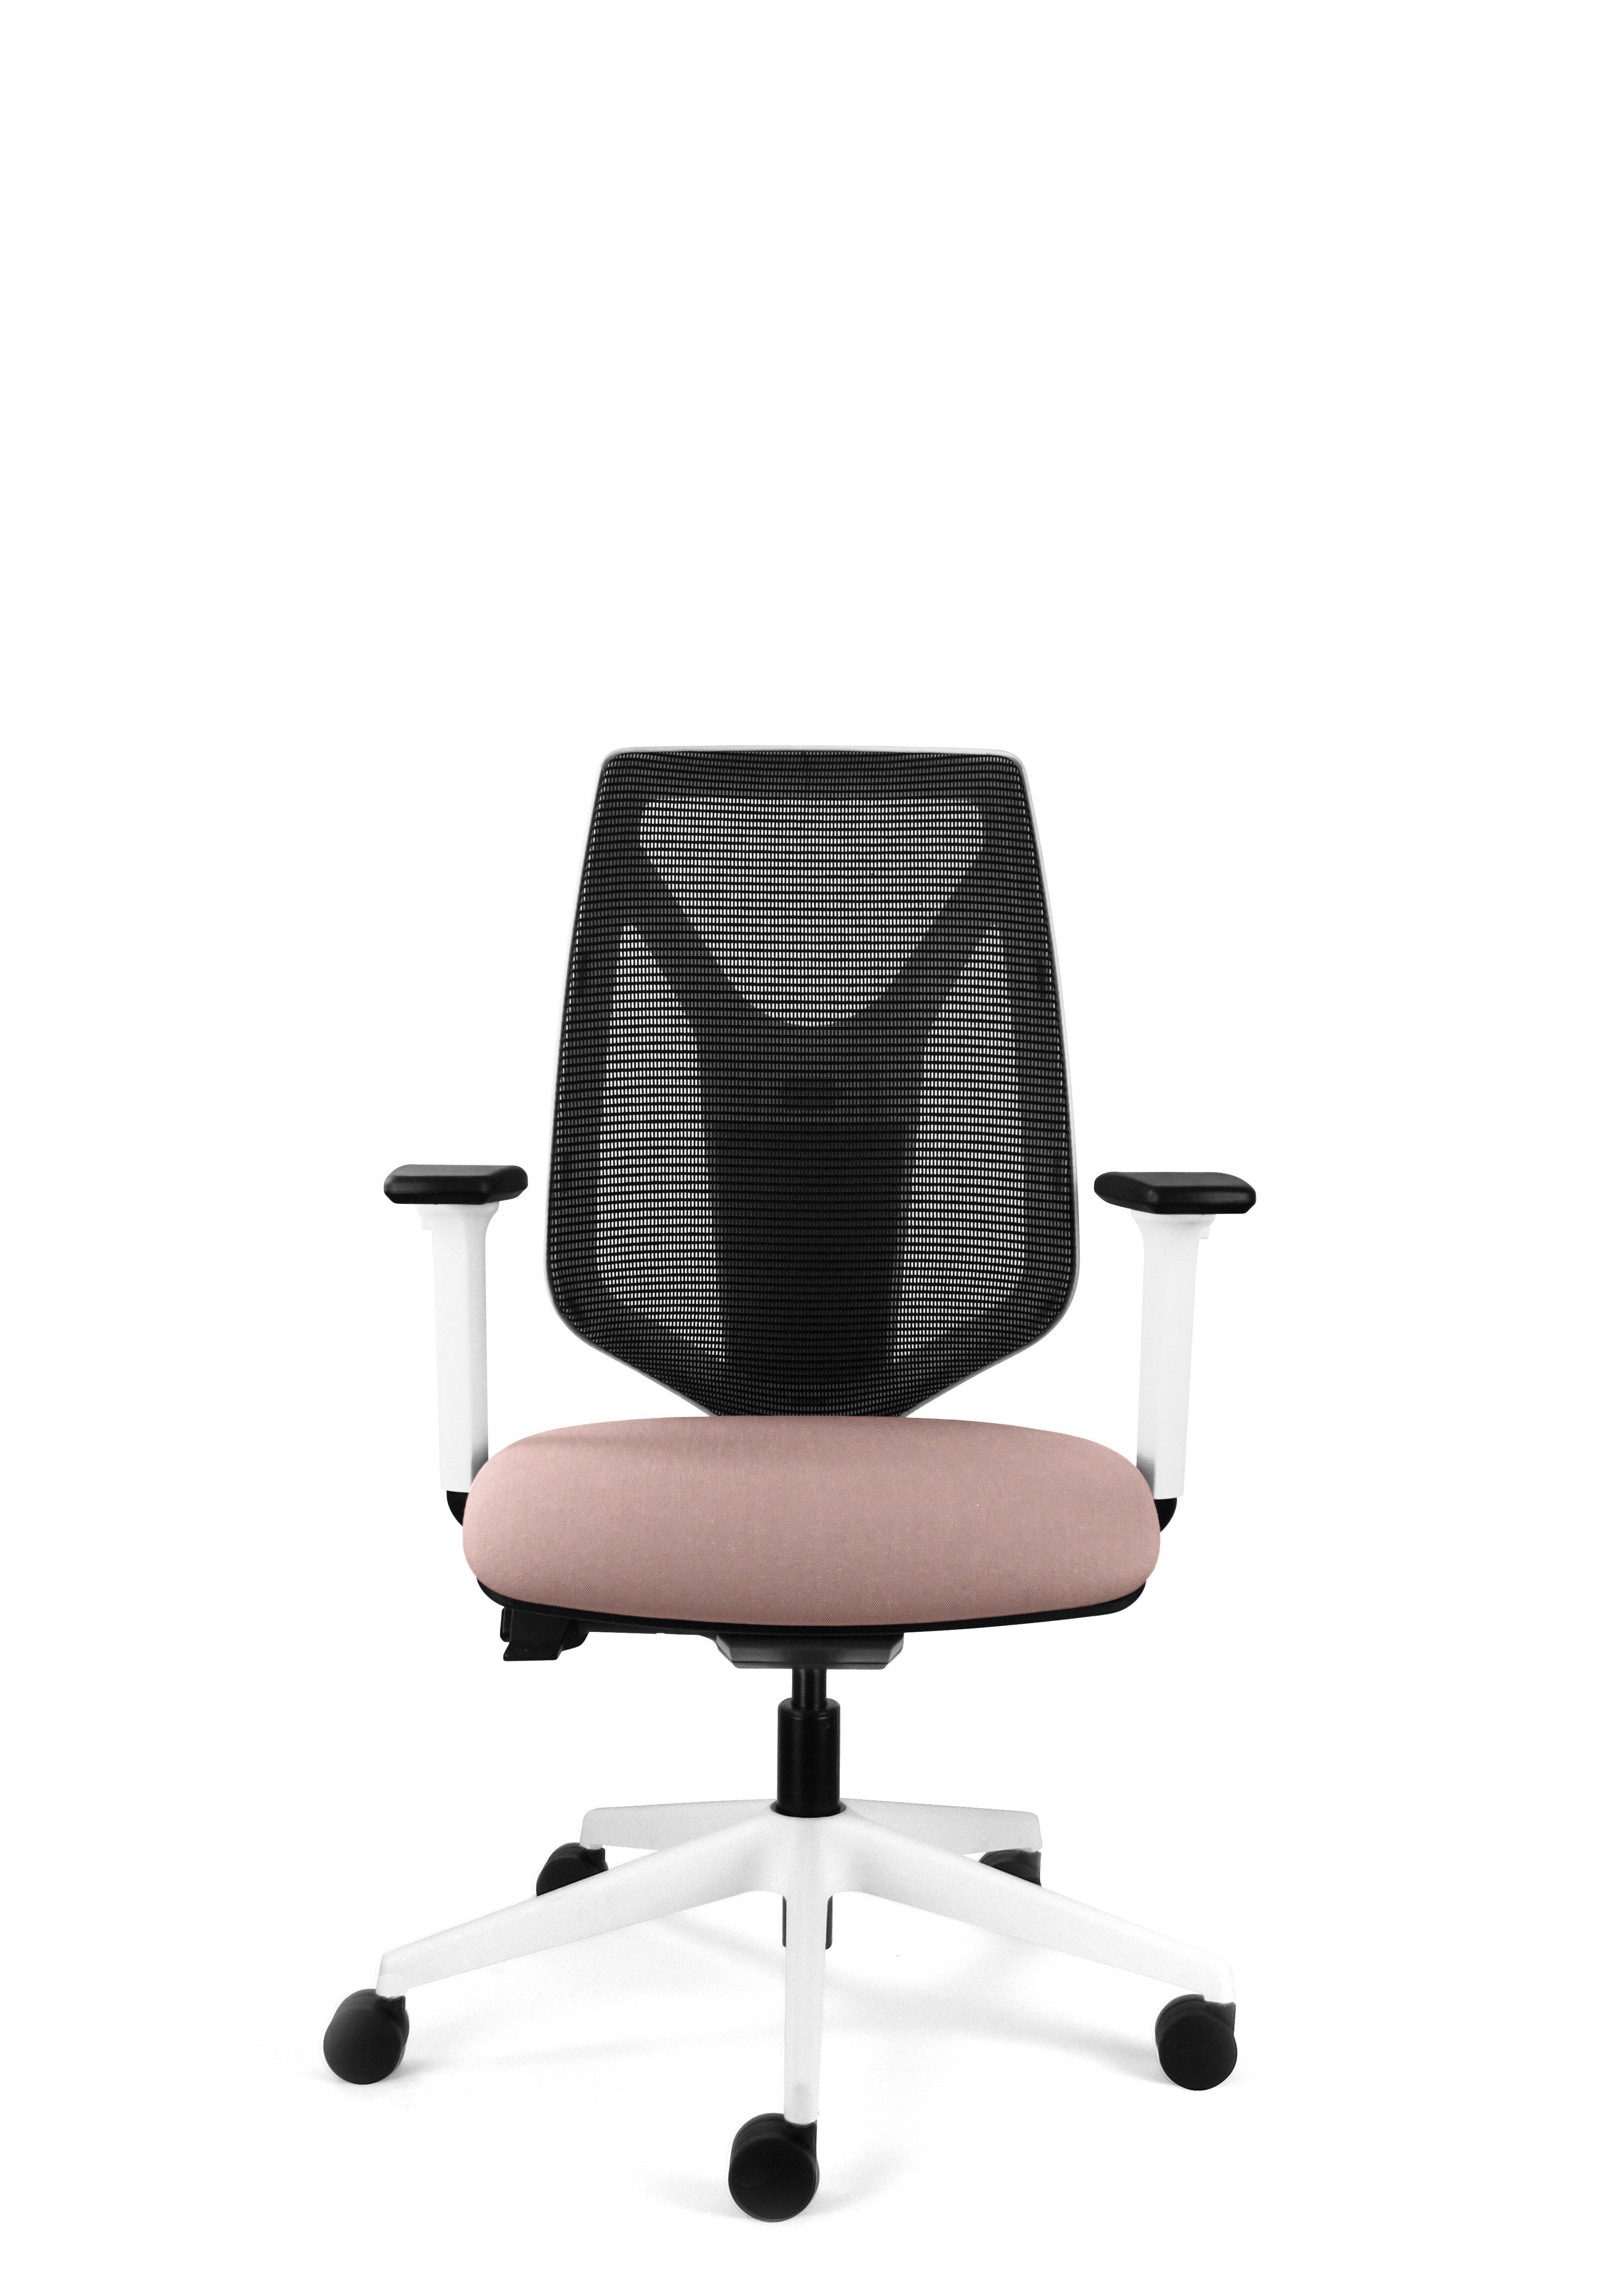 Image of: Ebern Designs Botts Mesh Desk Chair Wayfair Co Uk